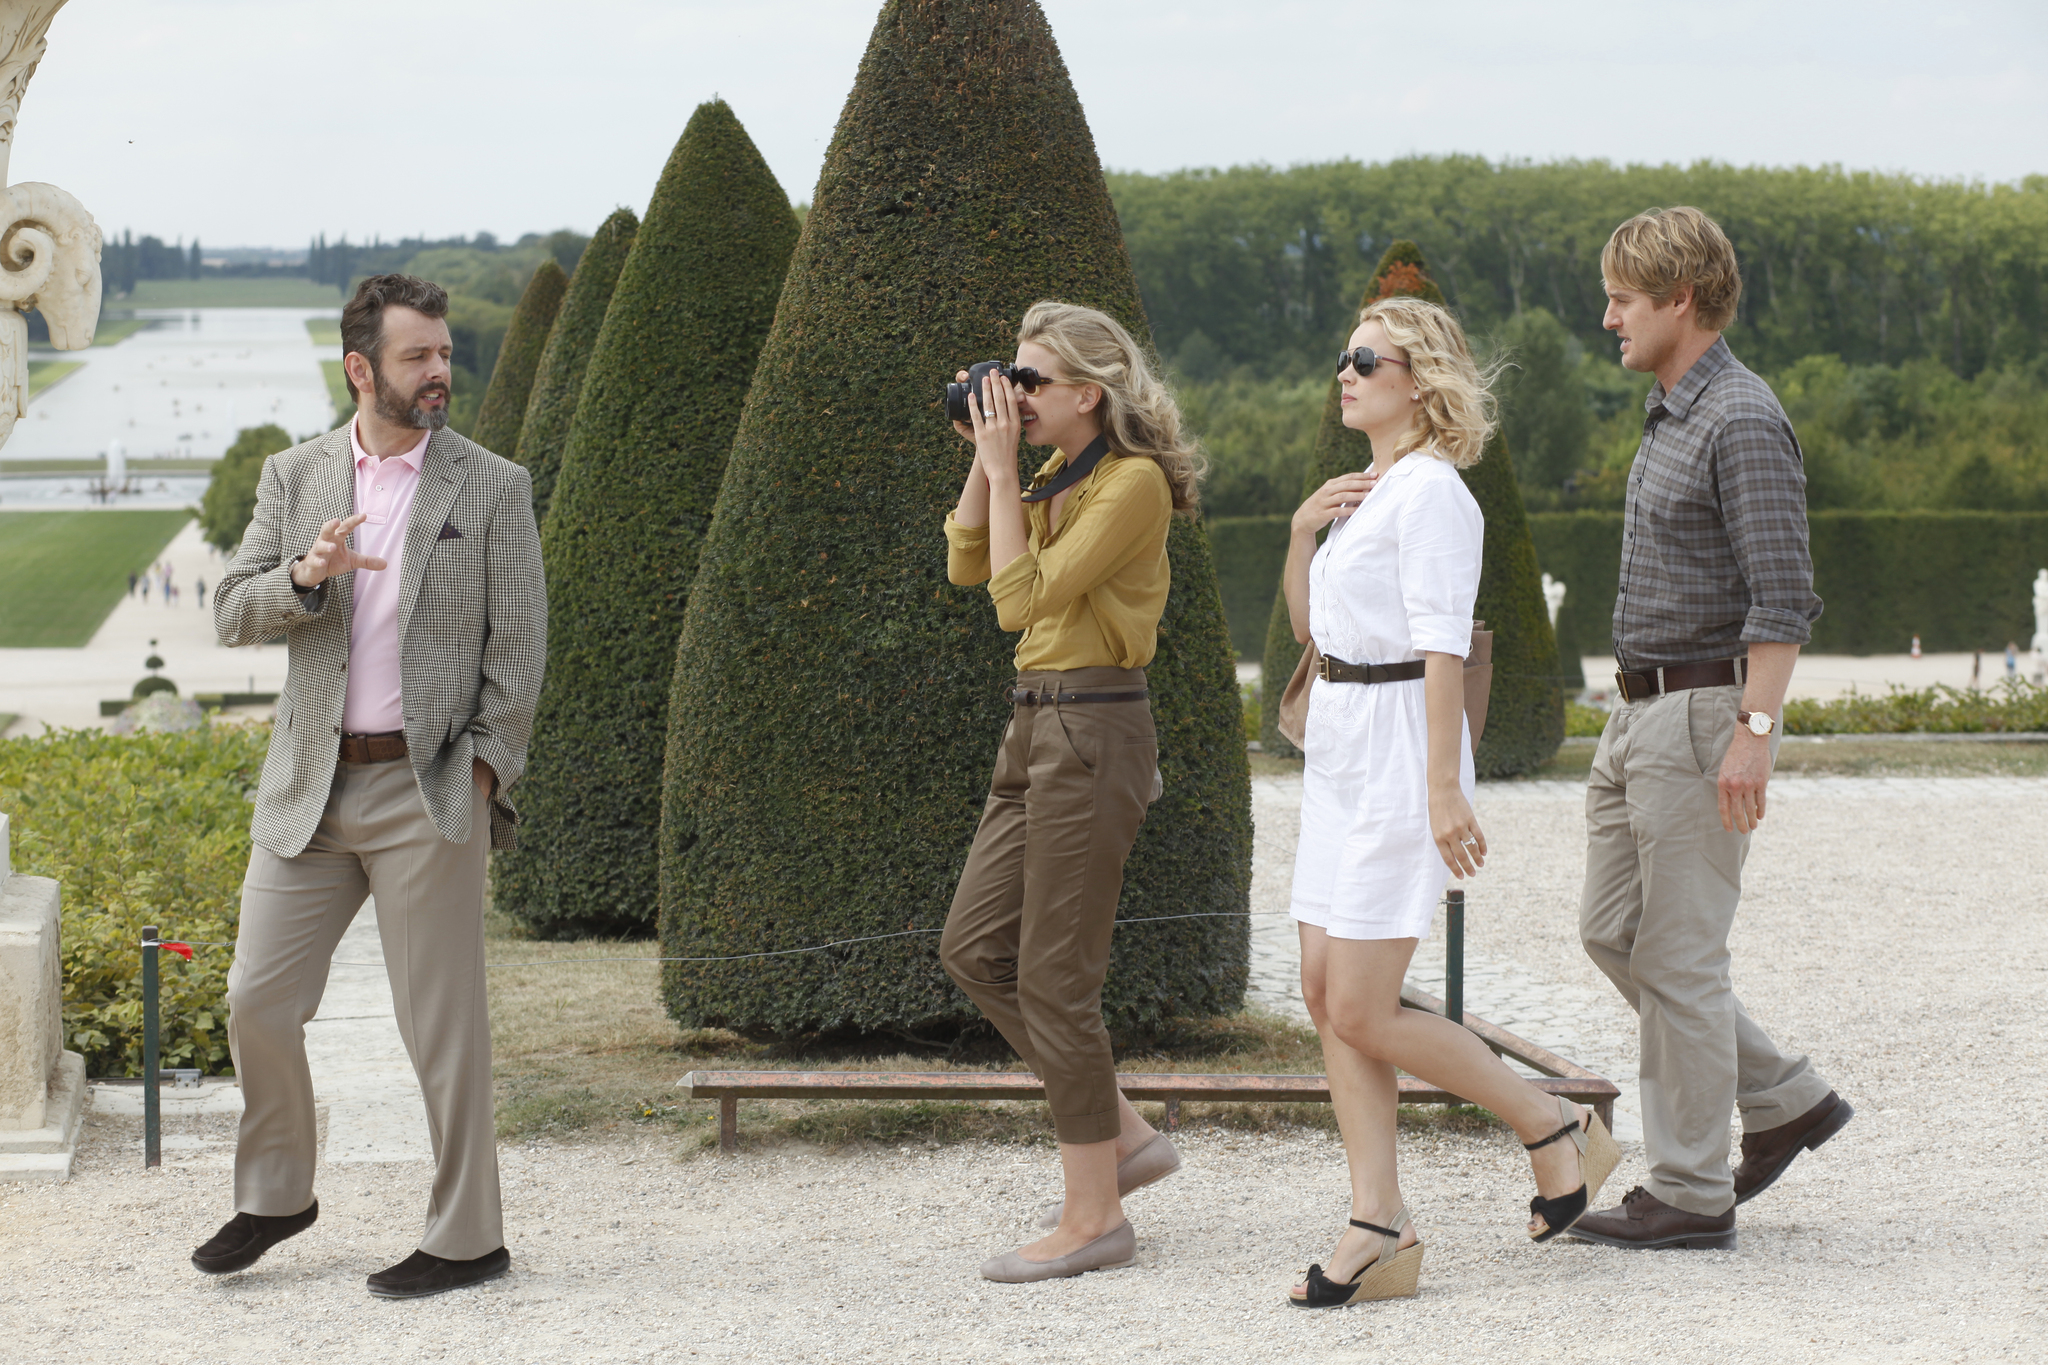 Owen Wilson, Michael Sheen, Rachel McAdams, and Nina Arianda in Midnight in Paris (2011)